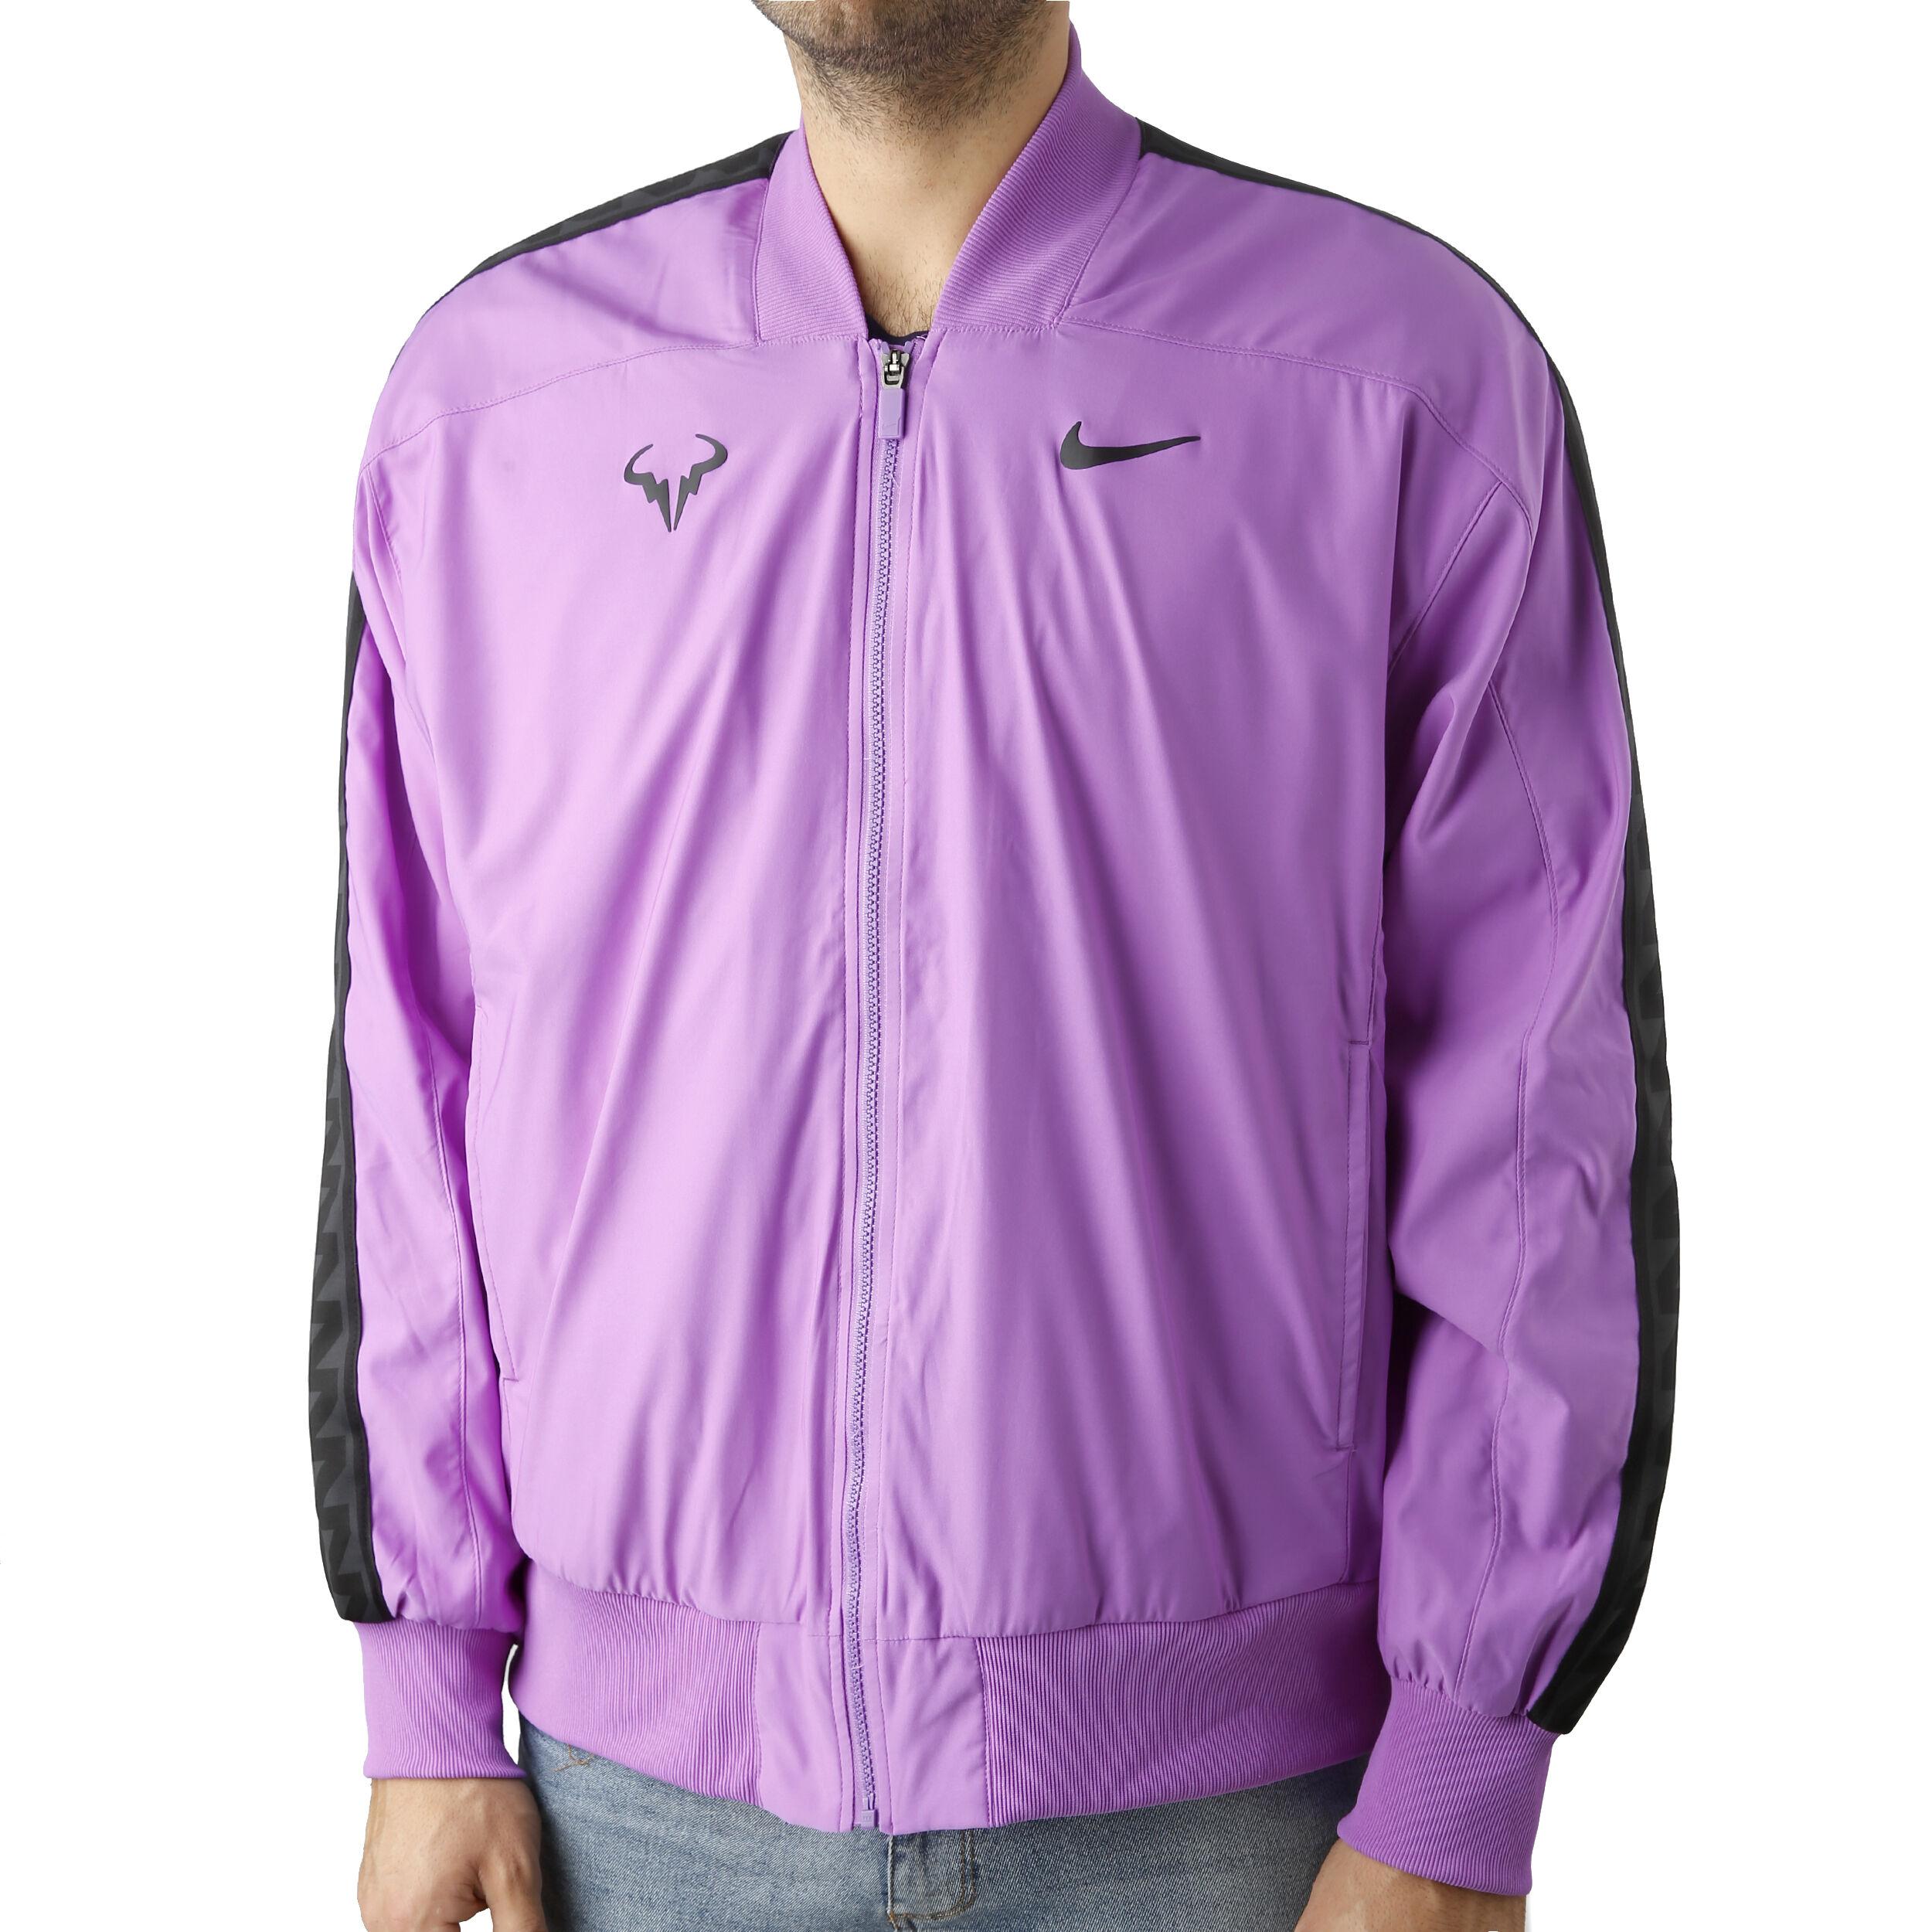 Nike Rafael Nadal Veste De Survêtement Hommes Violet